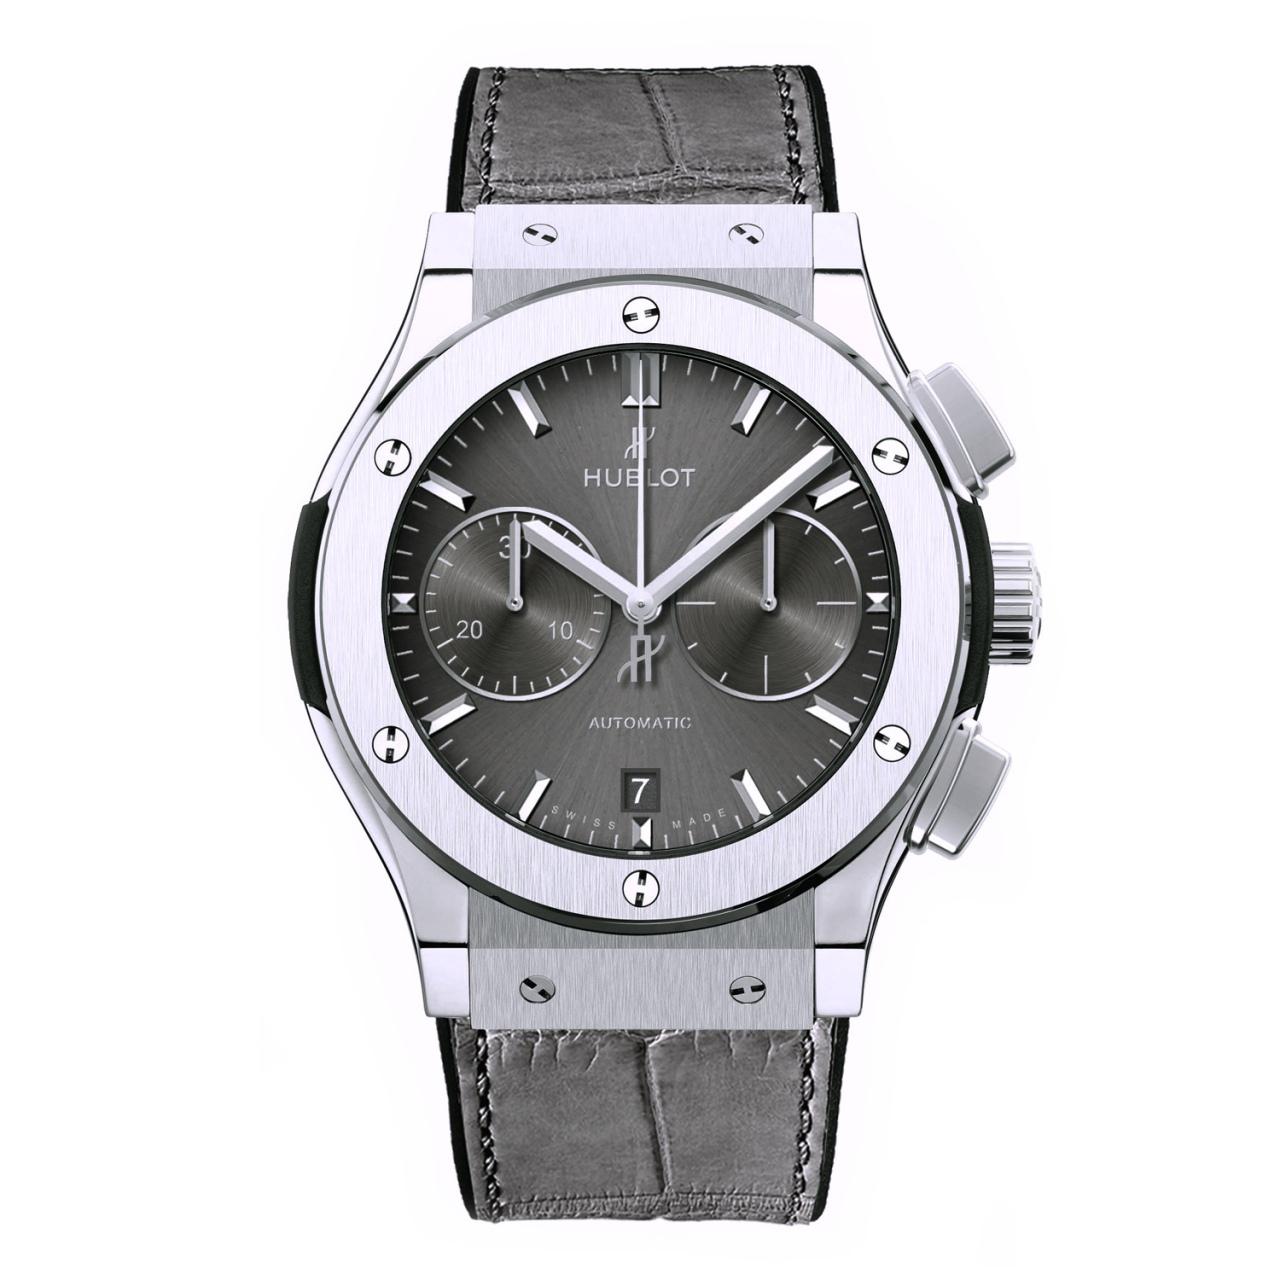 hublot-classic-fusion-chronograph-automatic-mens-watch-521-nx-7071-lr